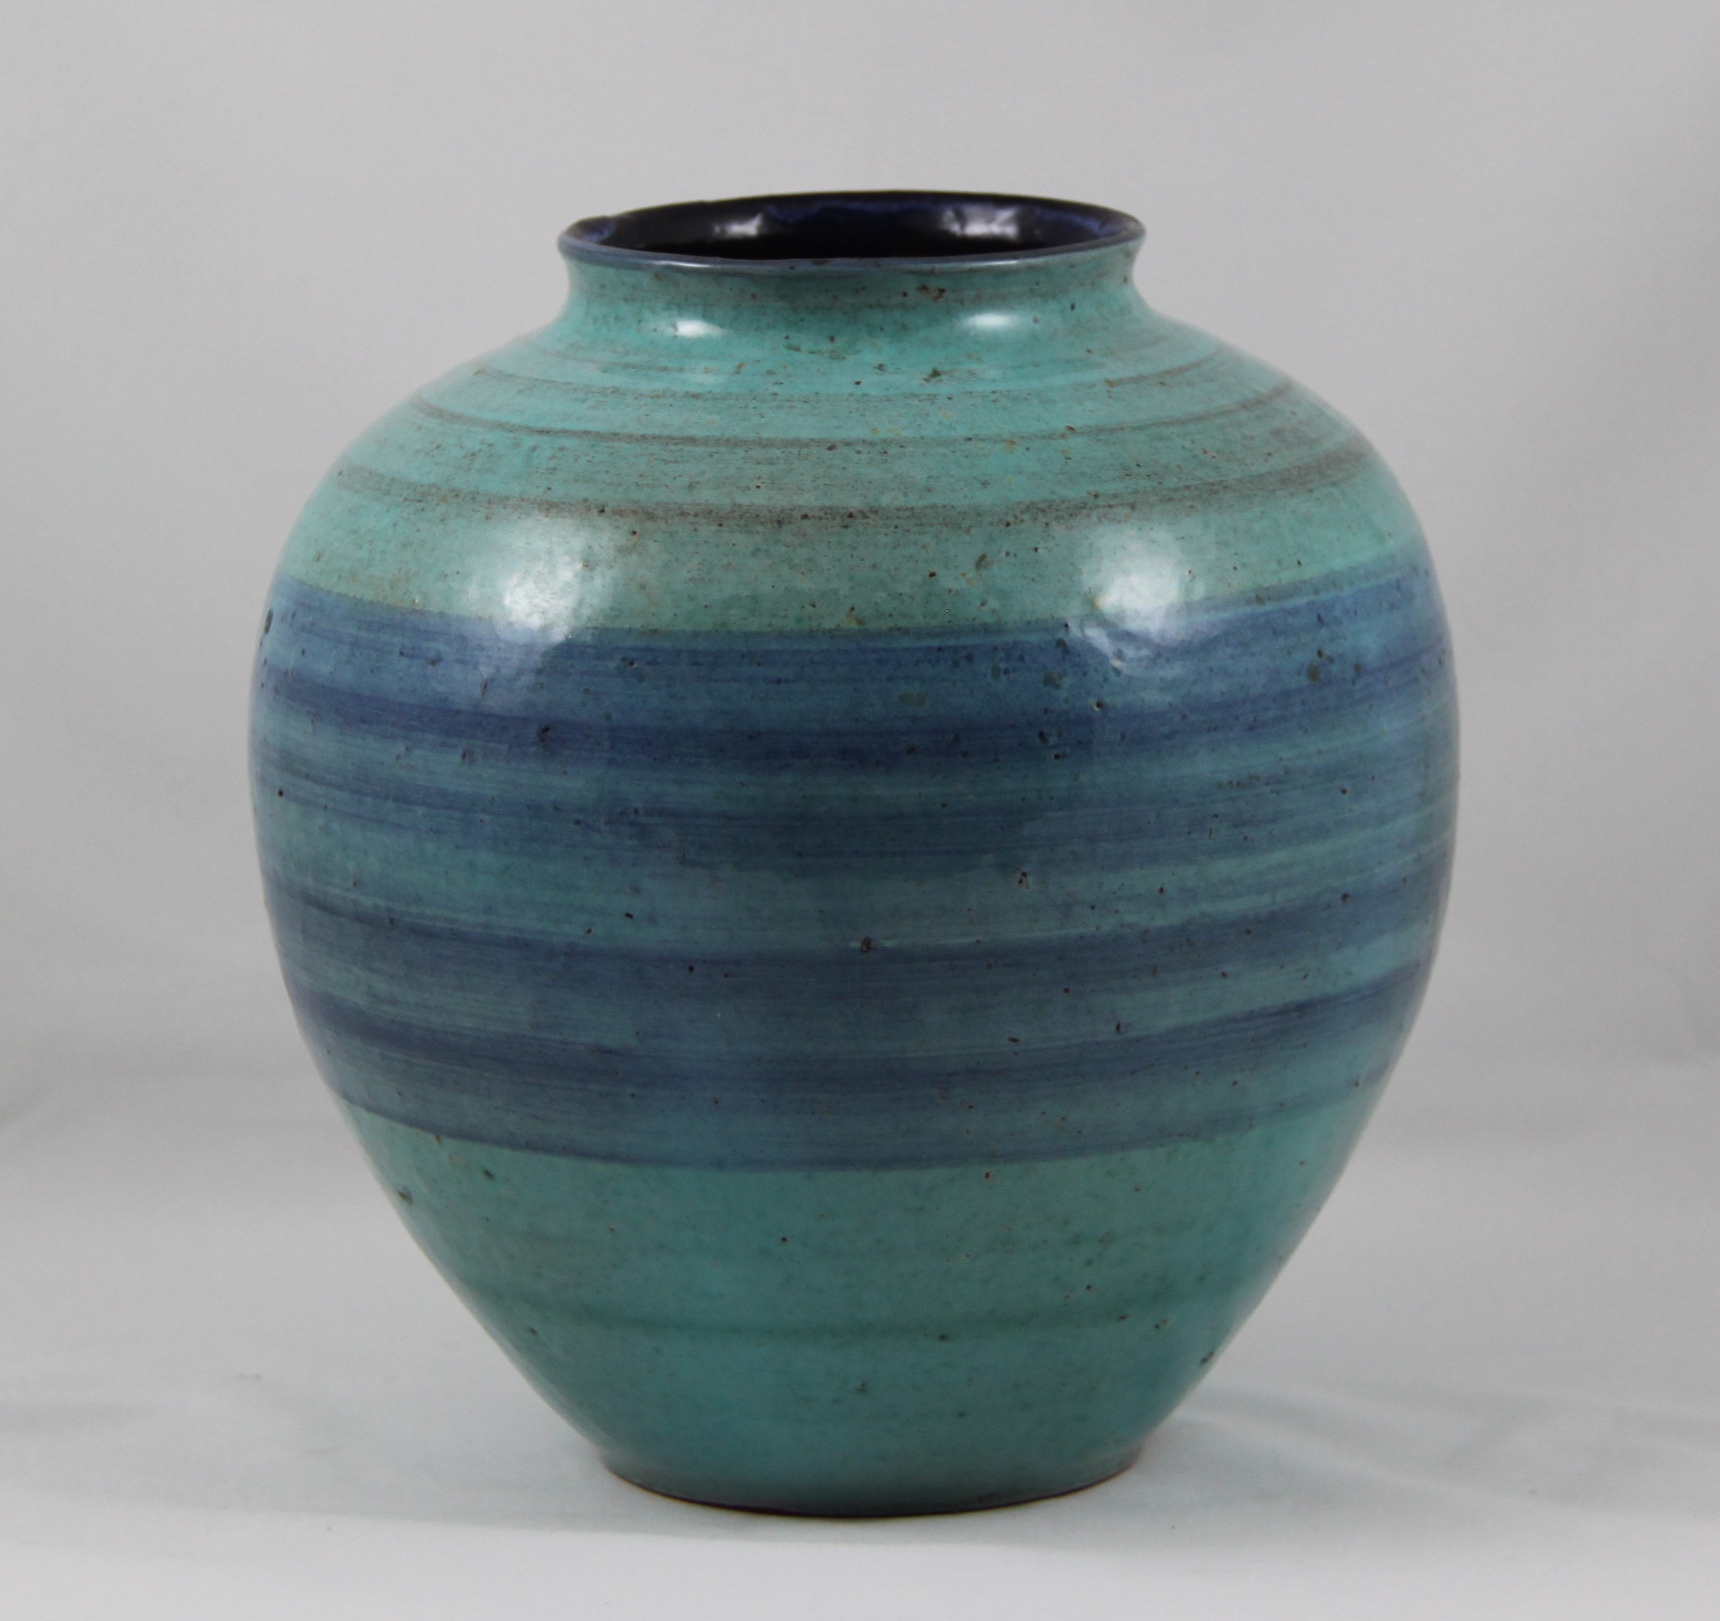 Allan Lowe – Vase